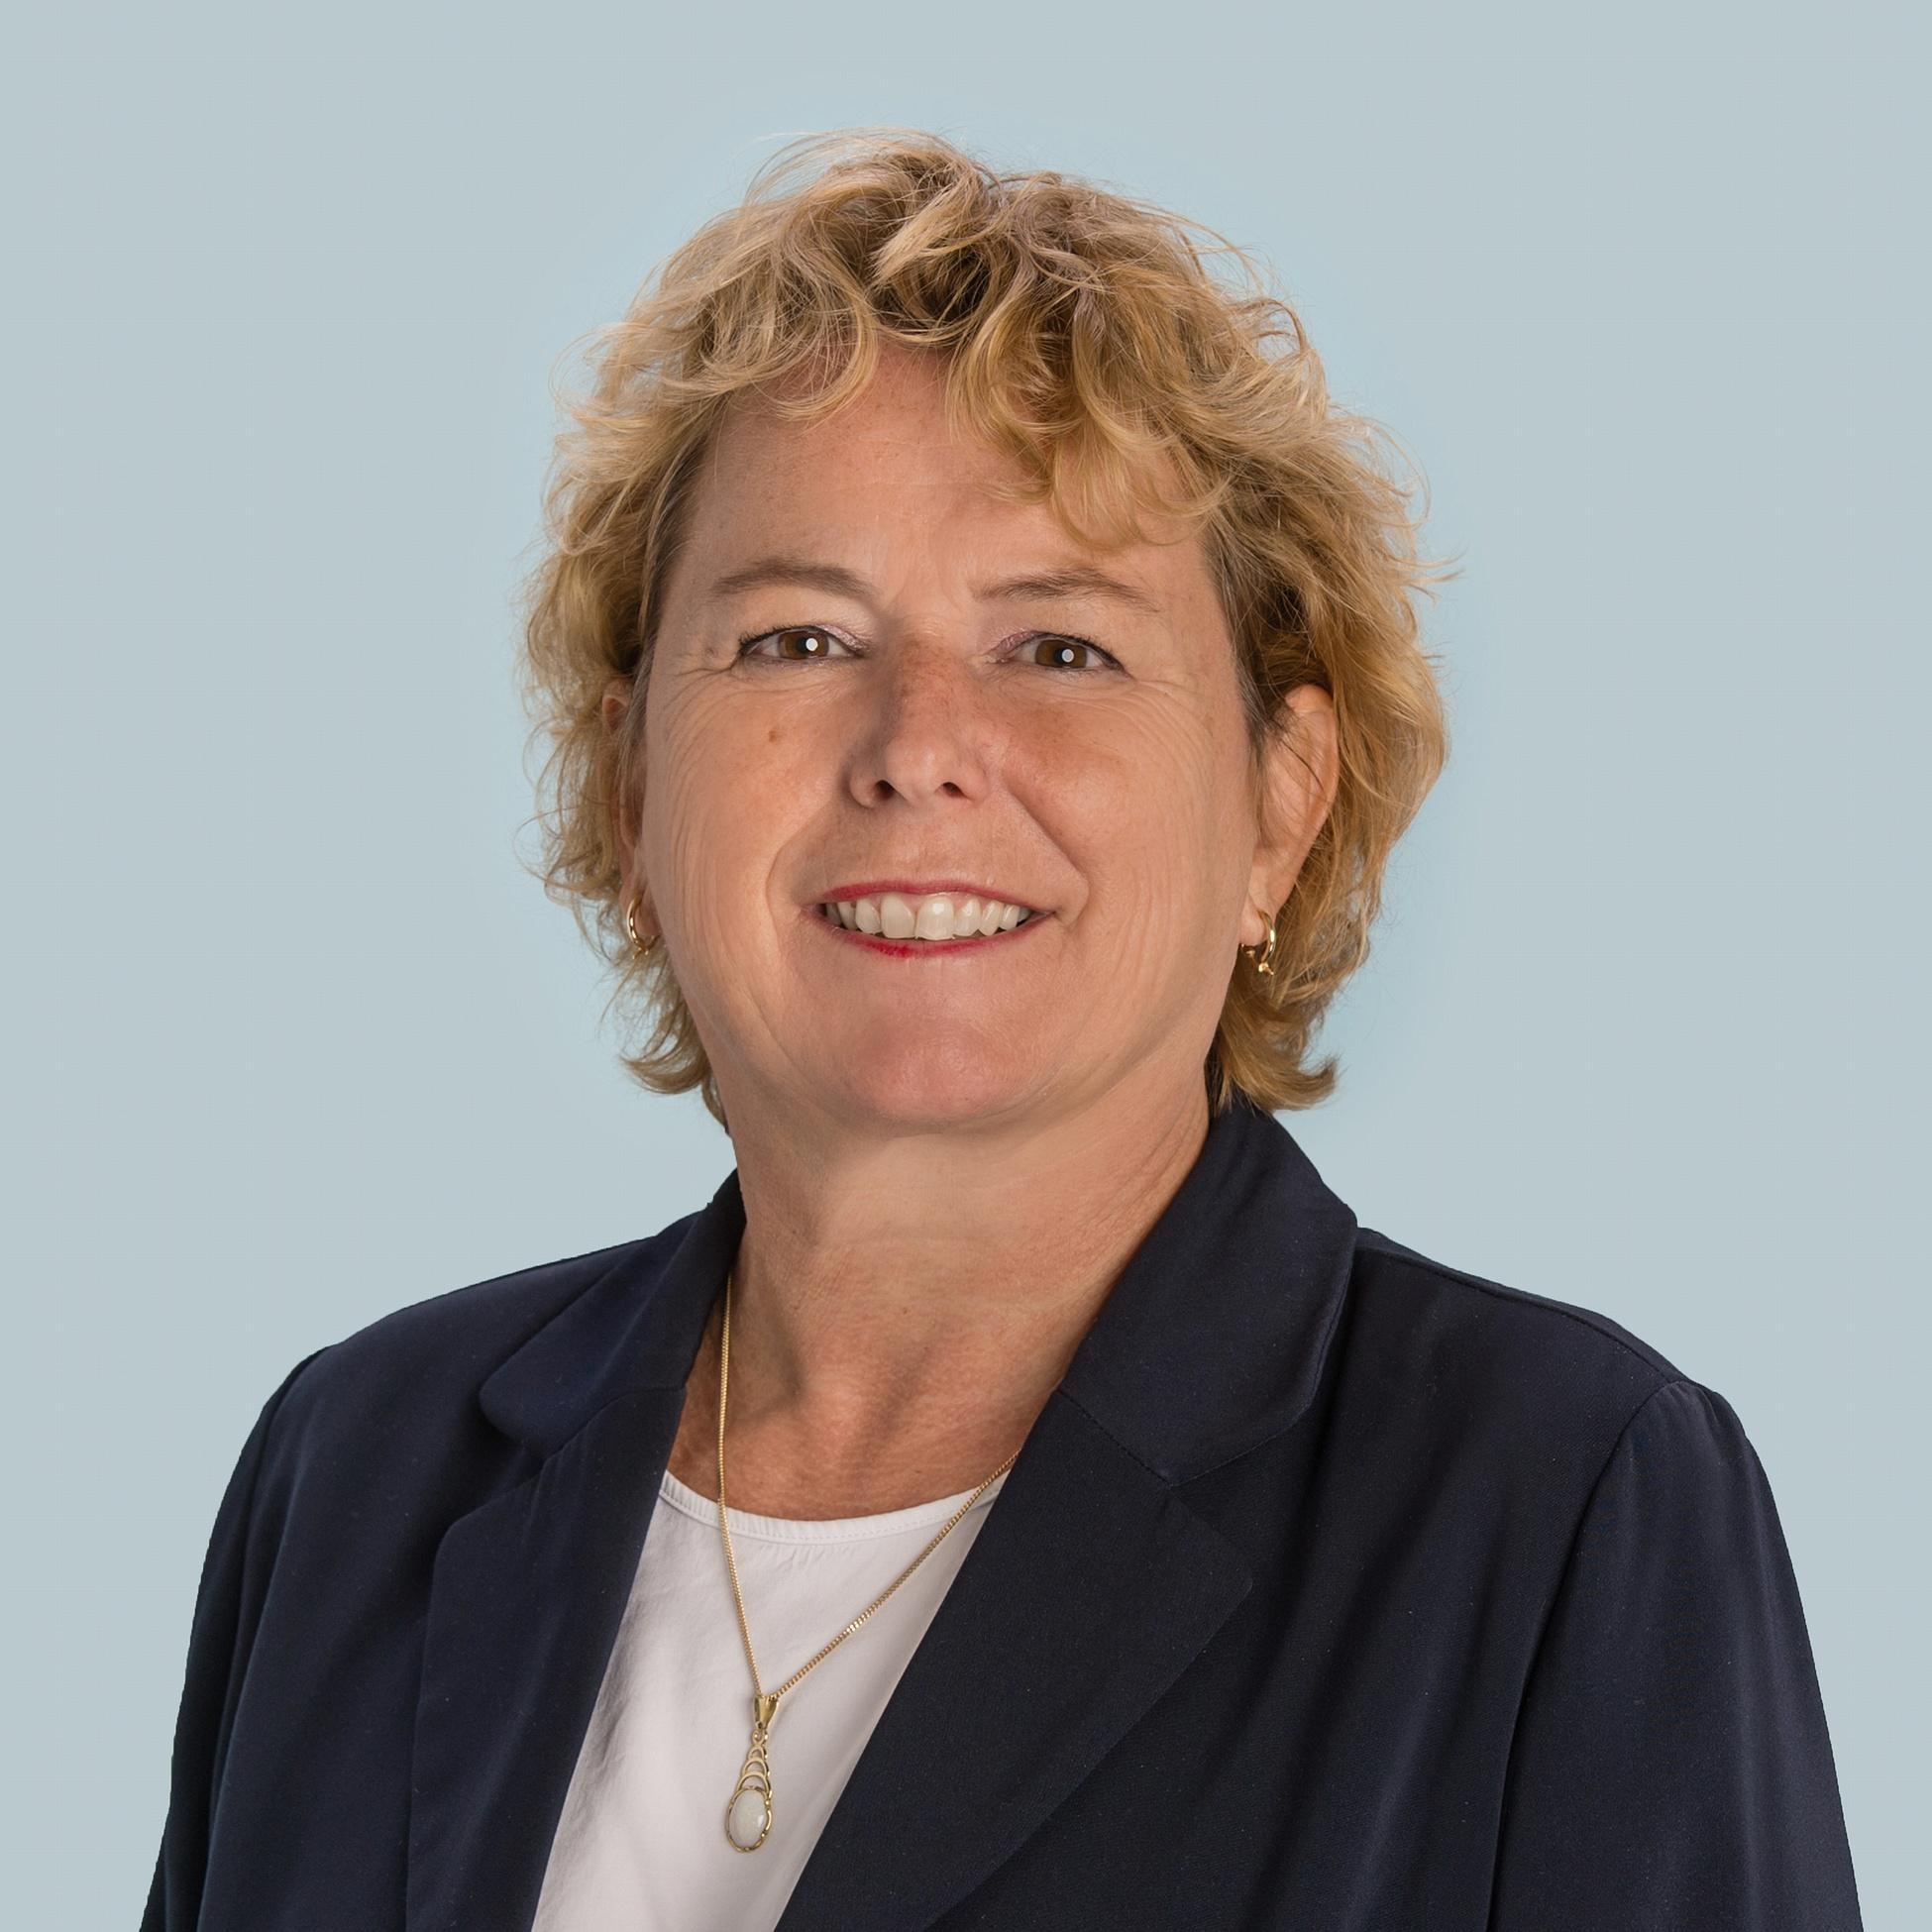 Jolanda van Koeveringe-Dekker